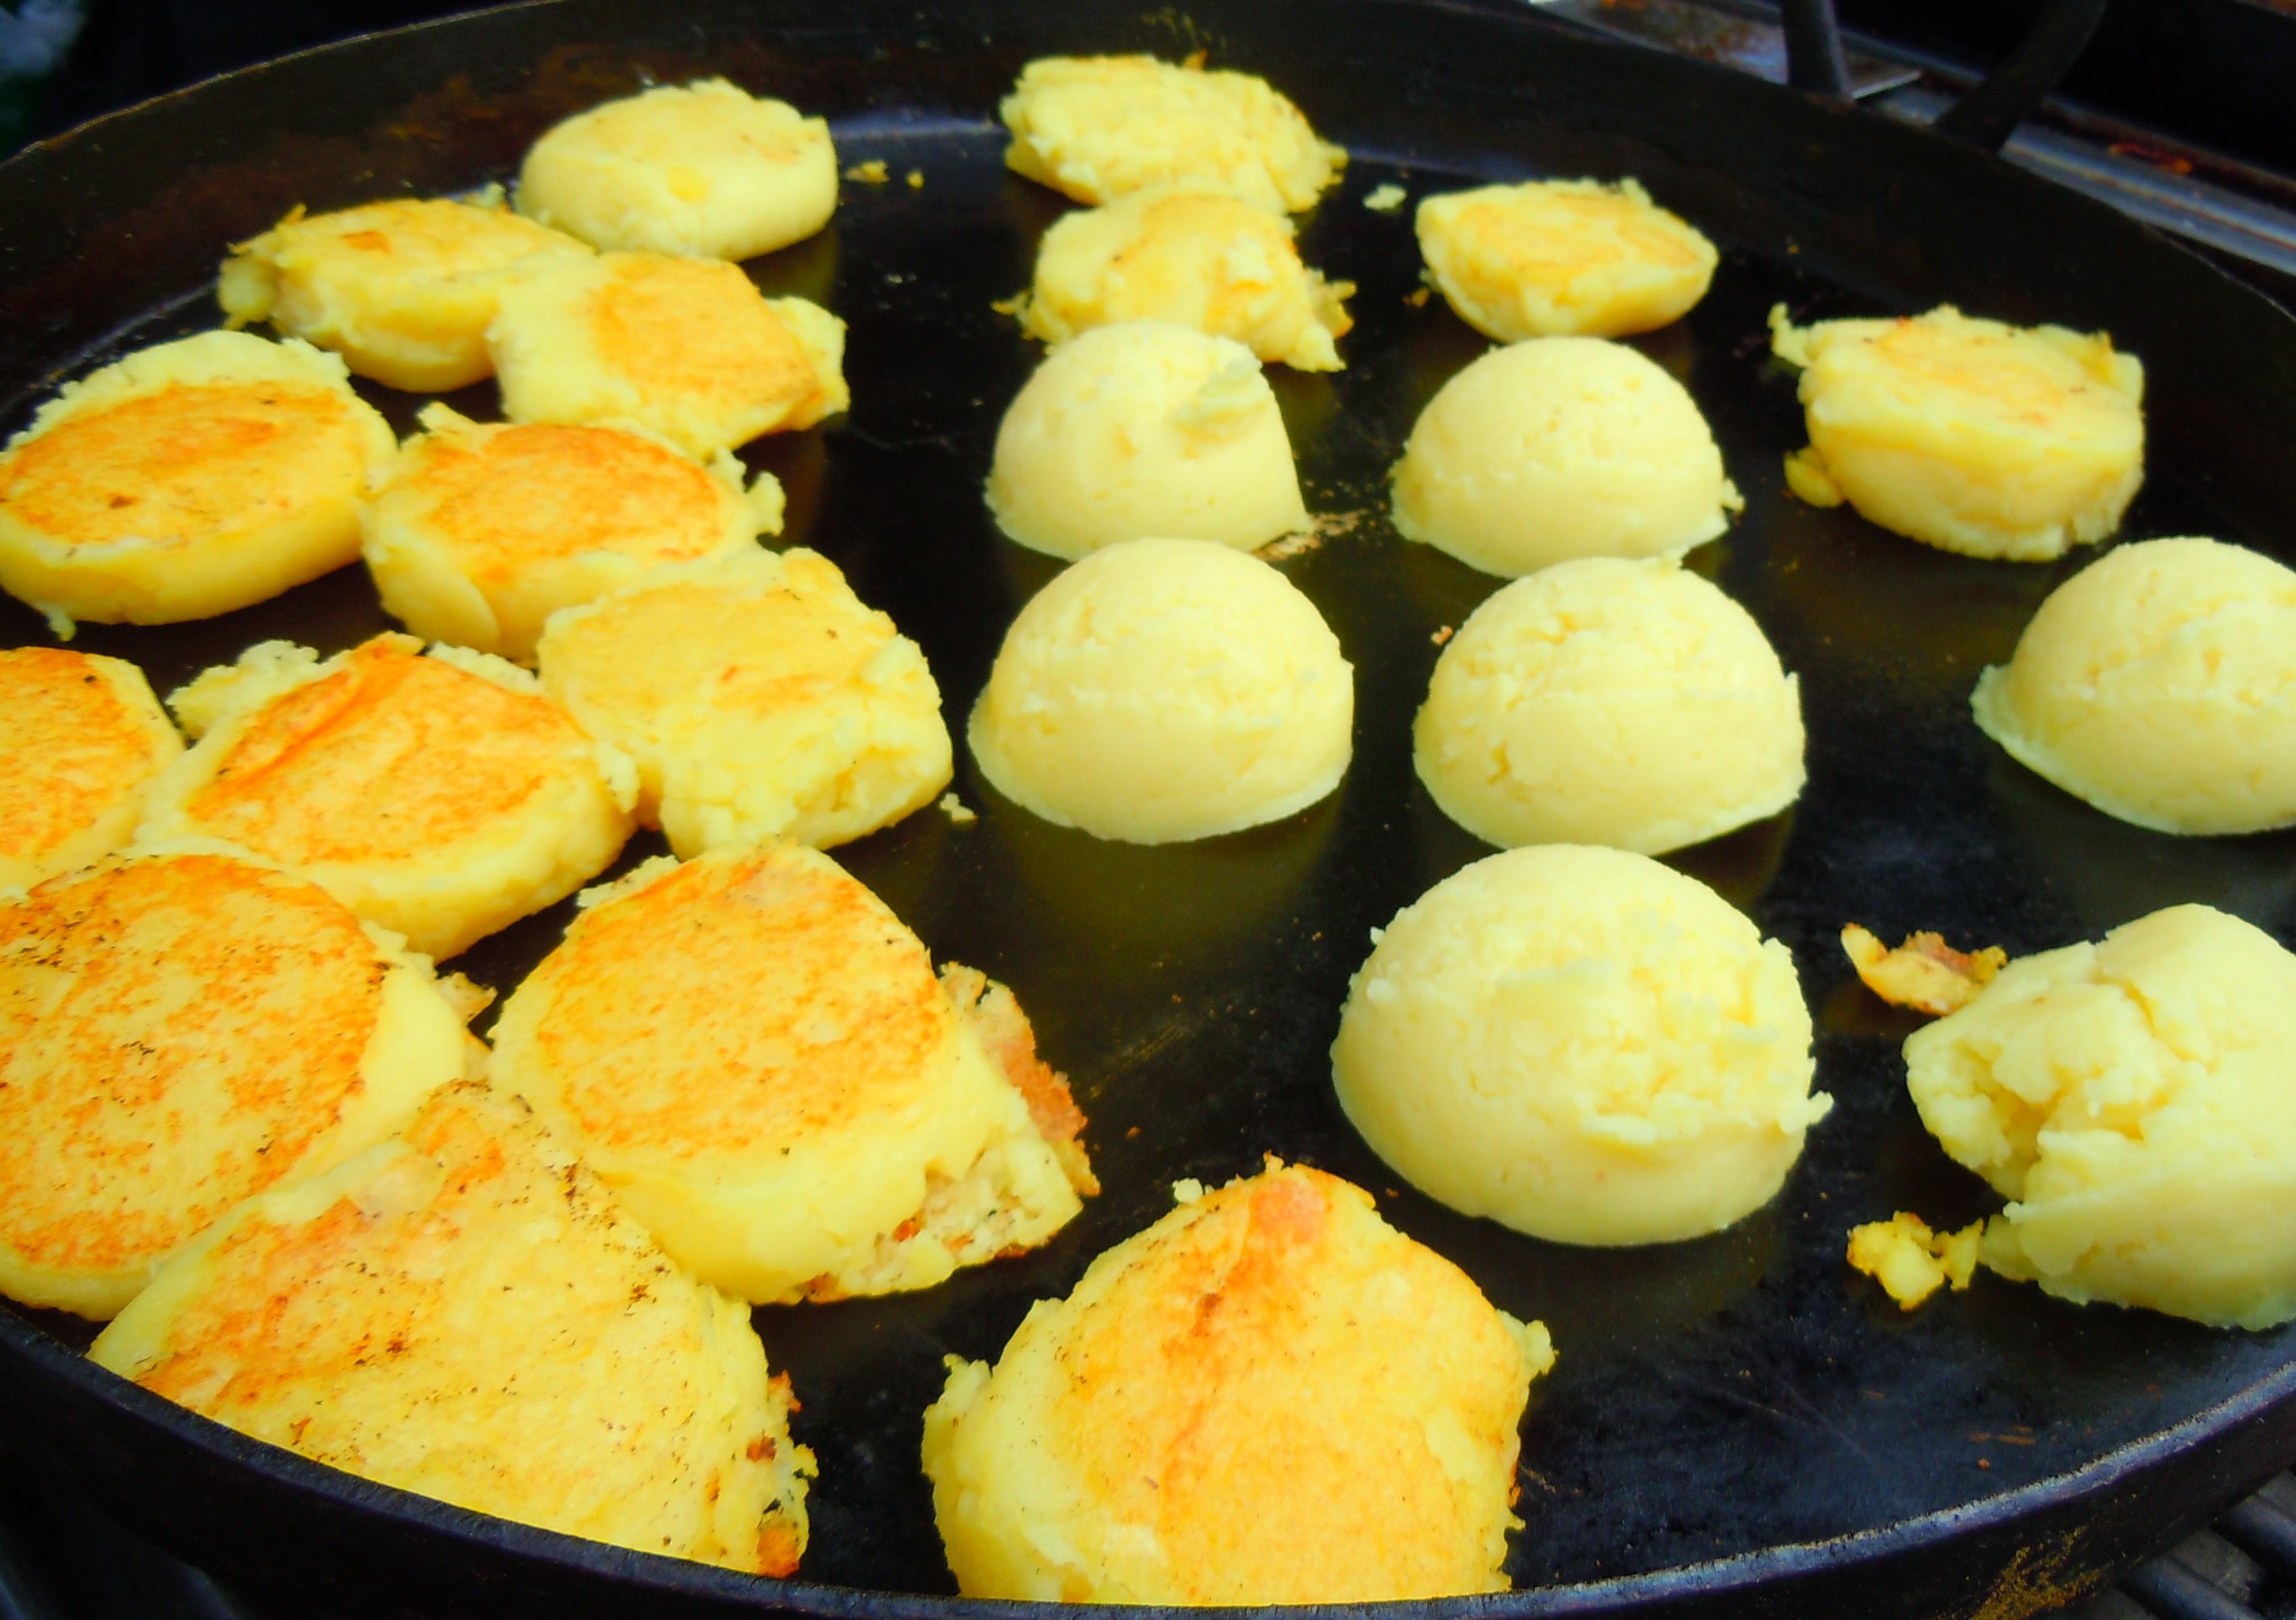 ... Tasty Thursdays! Cornbread, Pulled Pork, and Cornmeal Mashed Potatoes